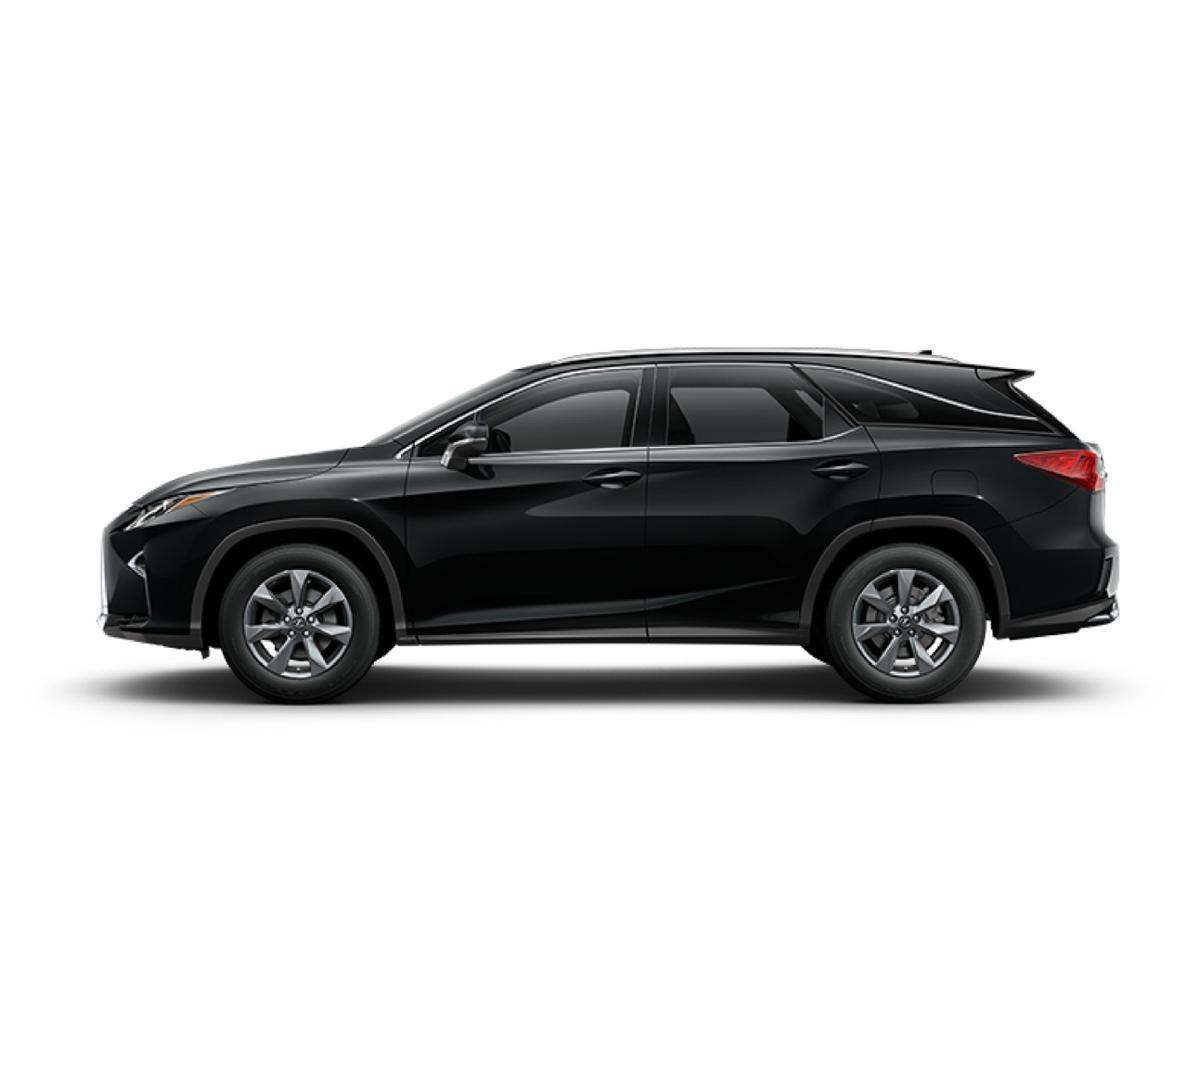 Used Obsidian 2018 Lexus RX 350L Premium FWD In West Palm